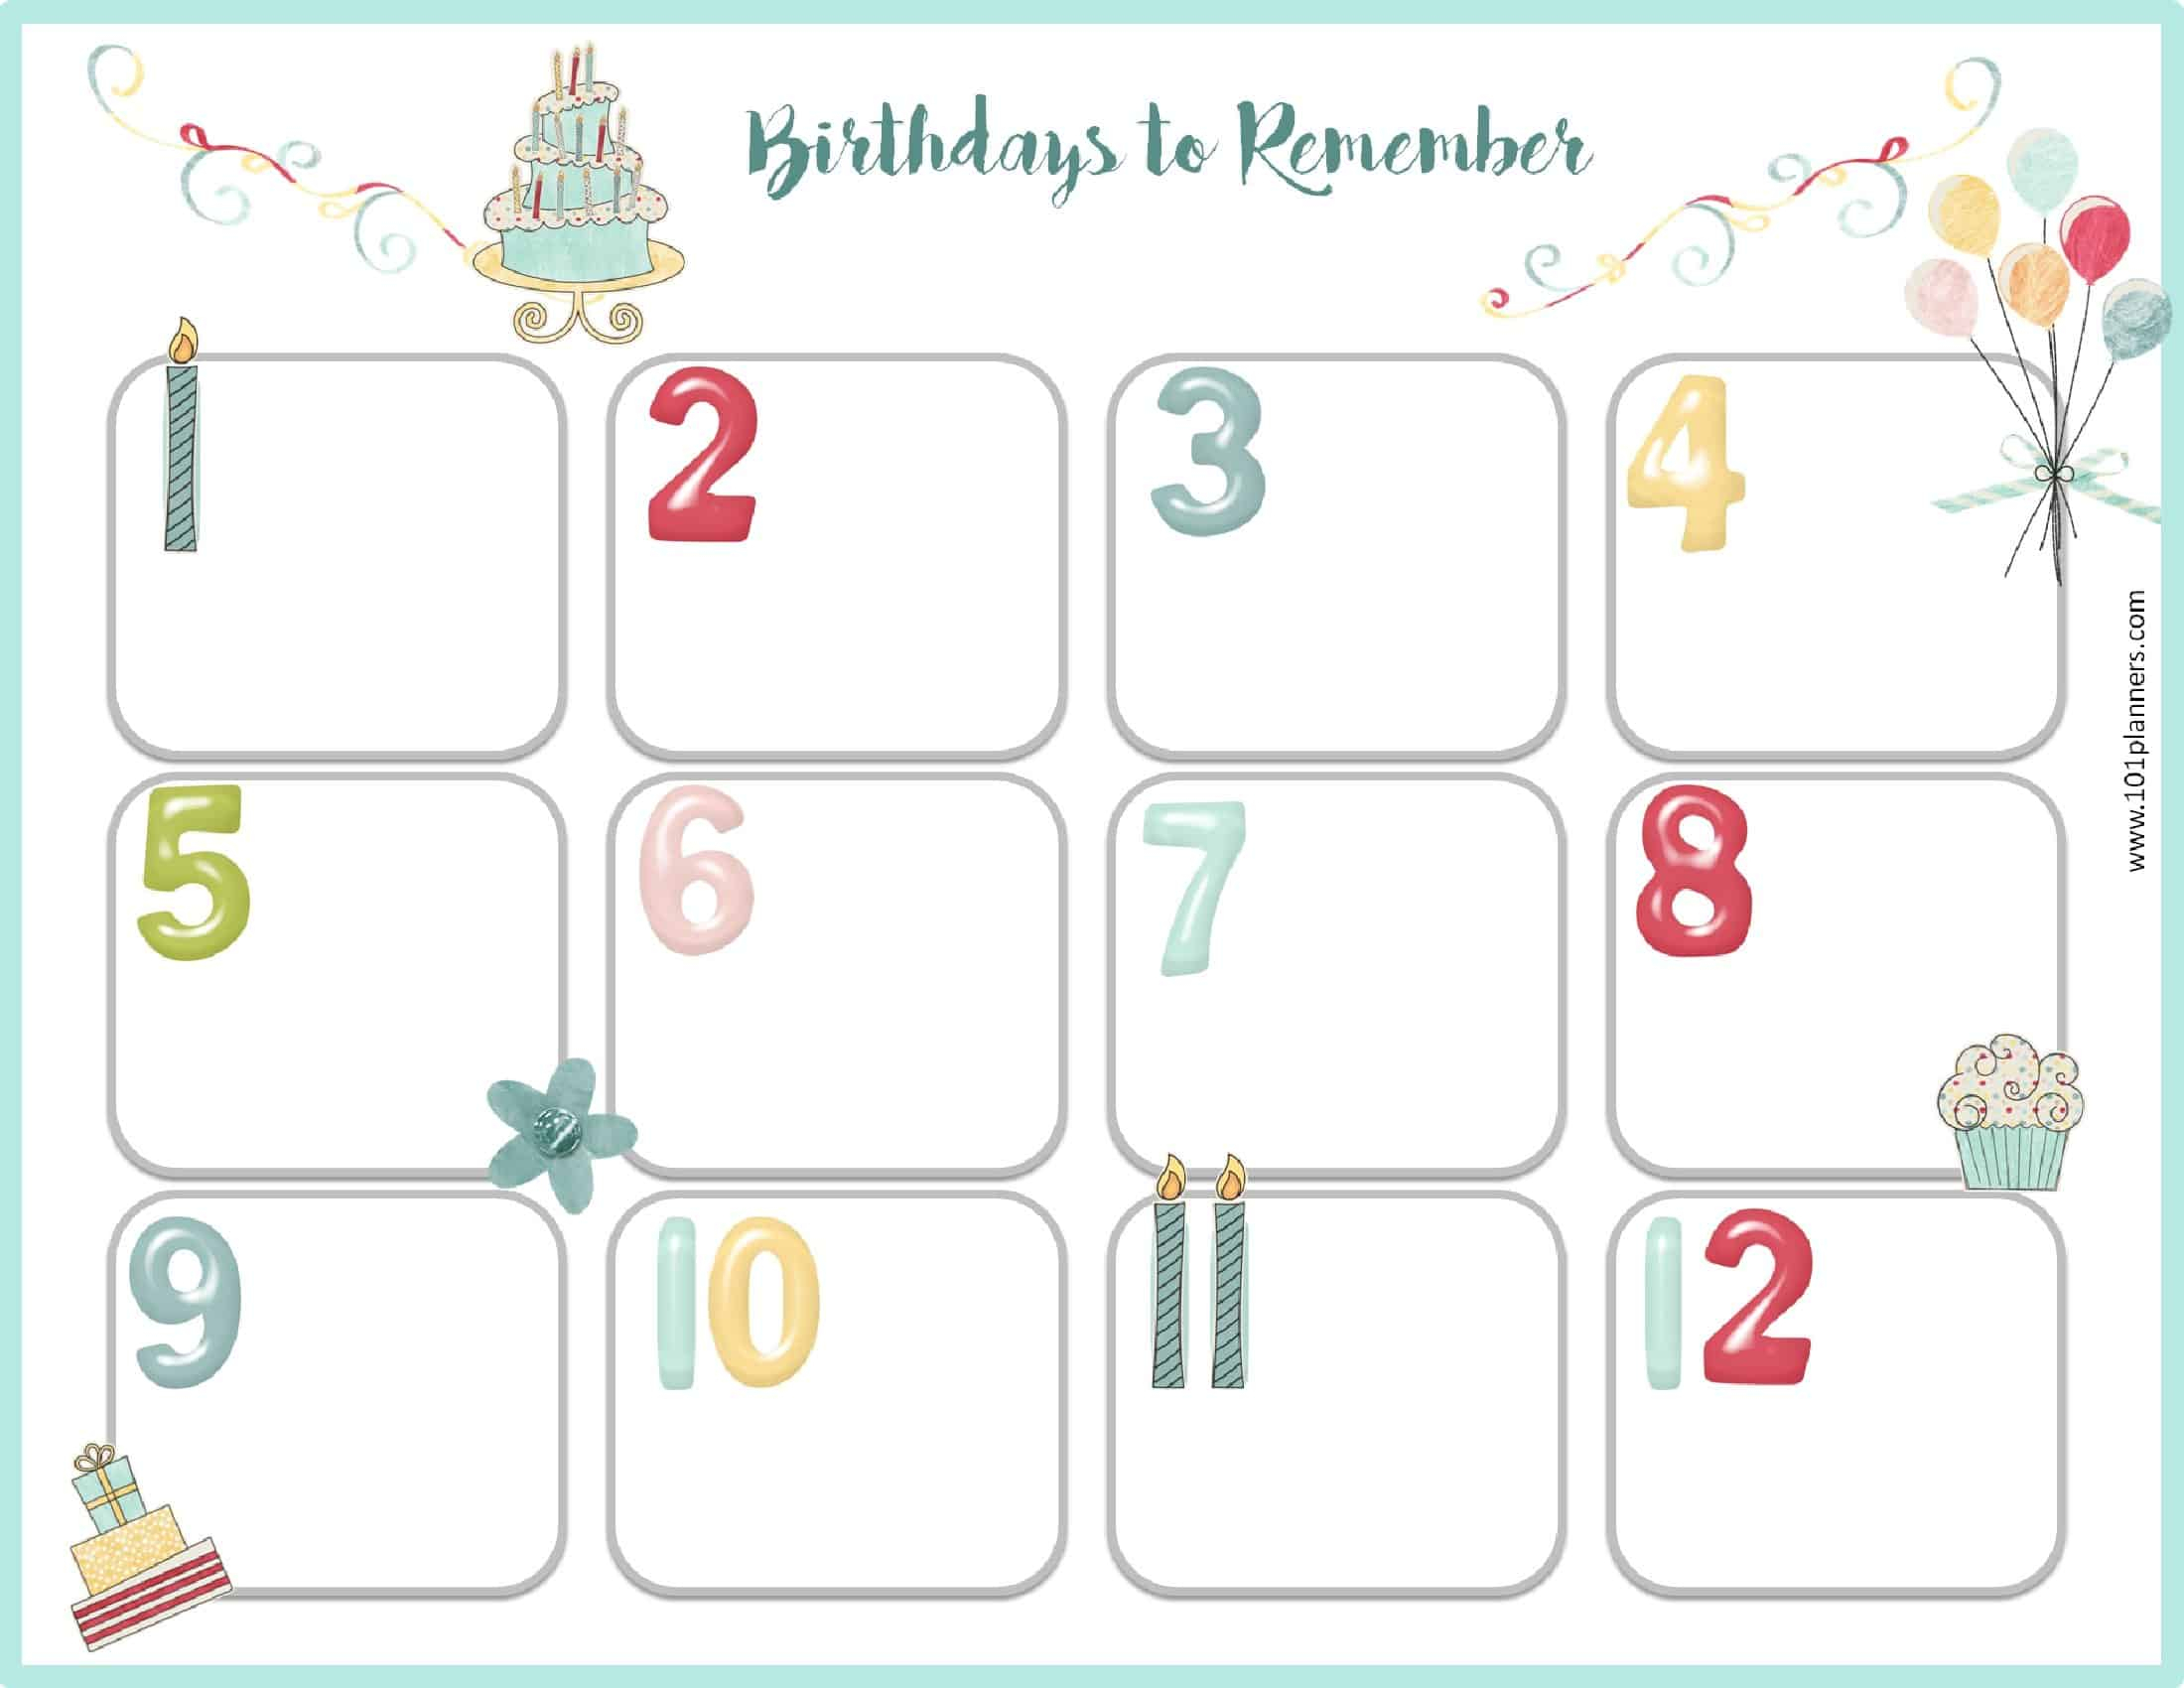 Free Birthday Calendar | Printable & Customizable | Many Designs! pertaining to Blank Monthly Birthday Calendars